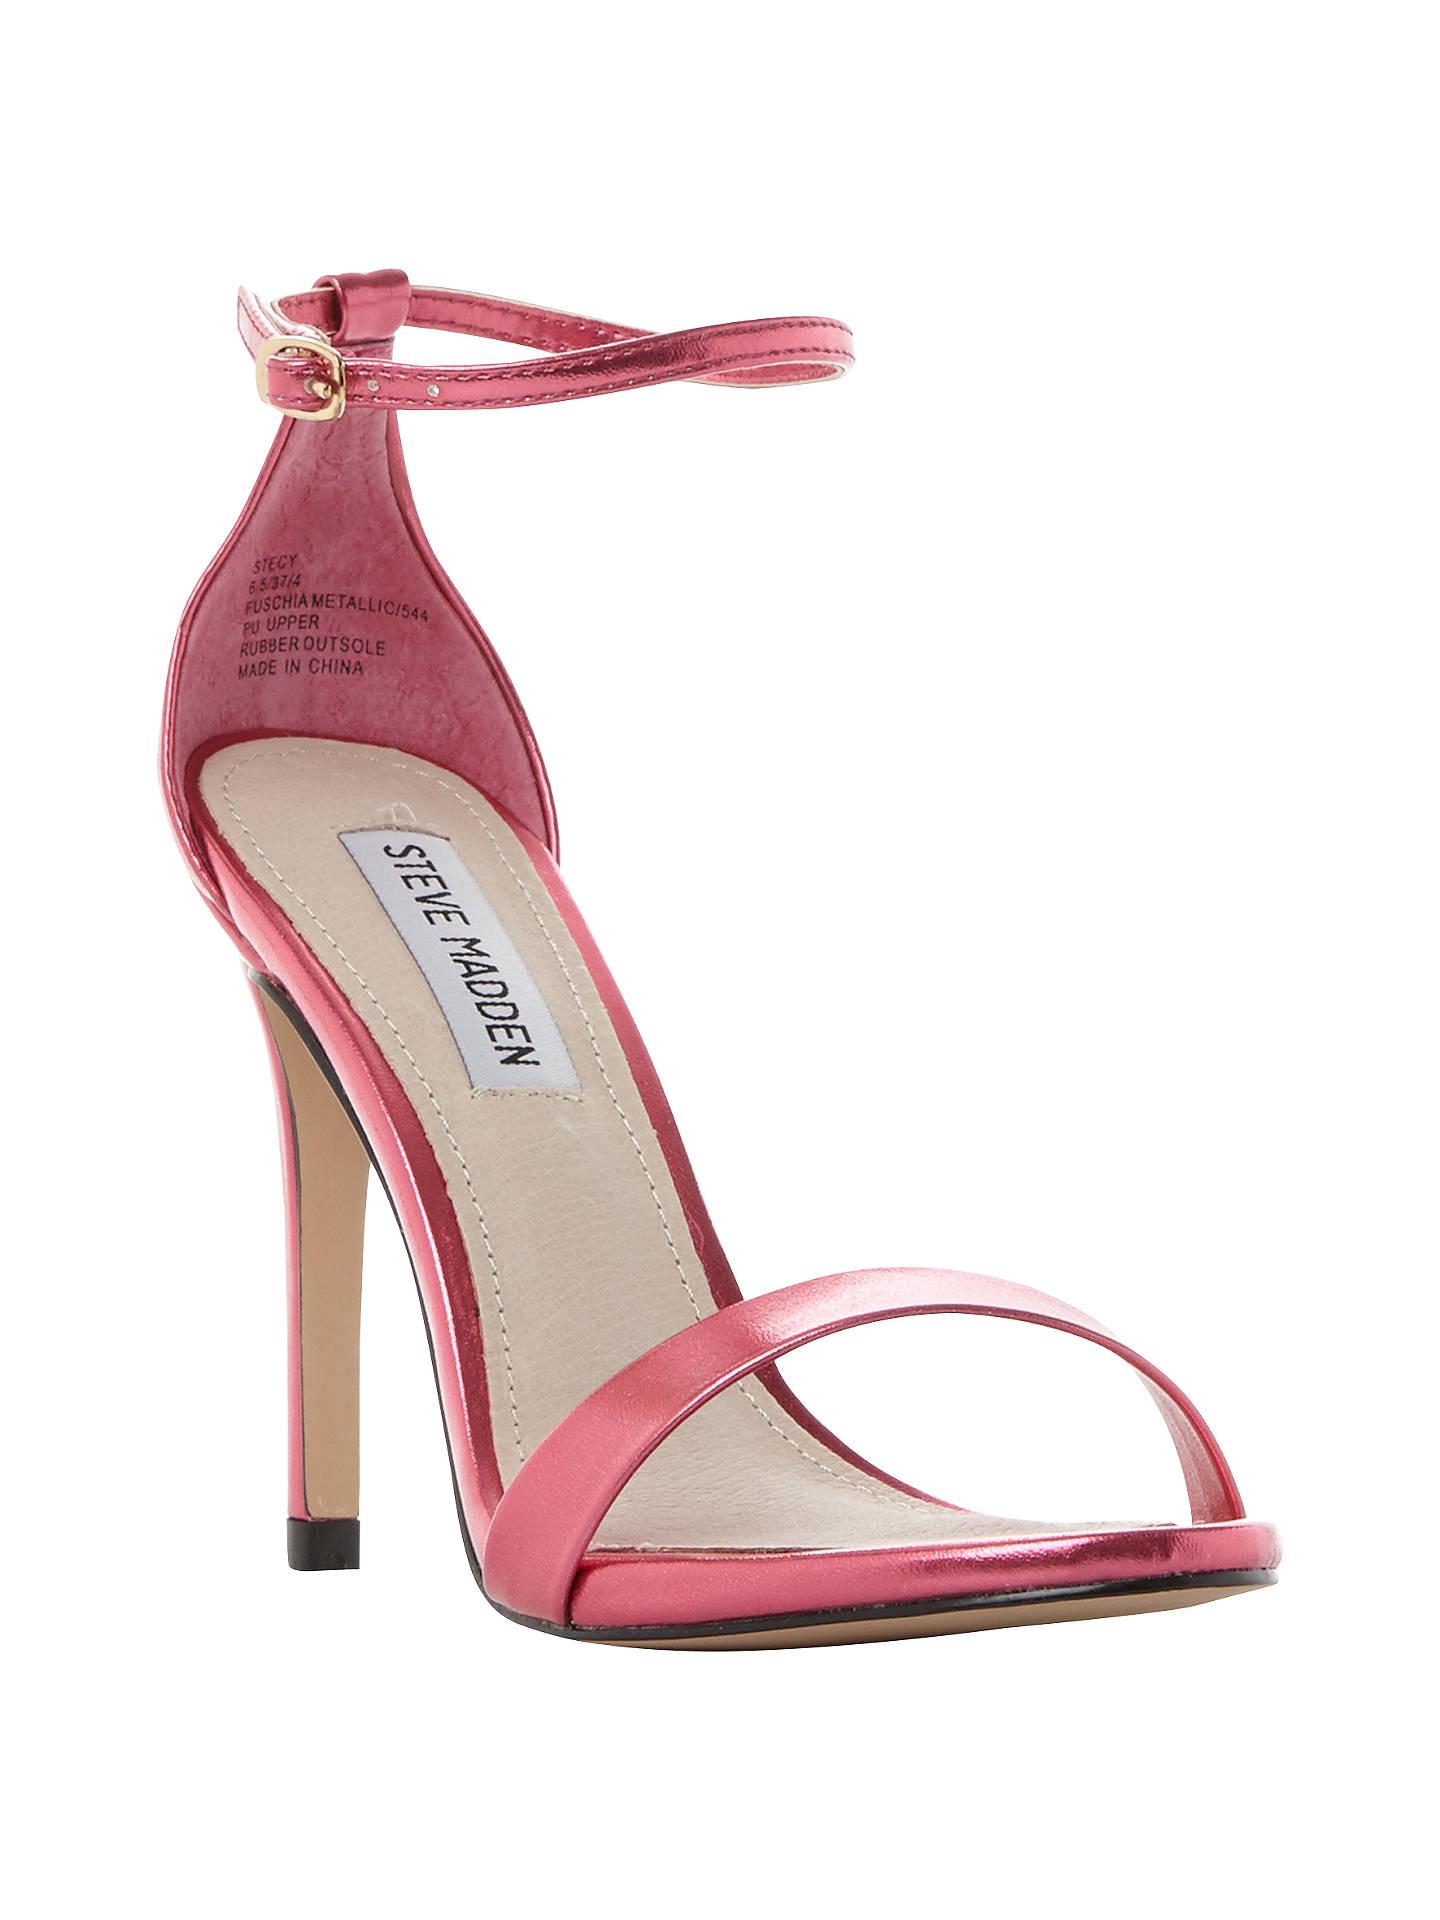 2632d059808 Buy Steve Madden Stecy Stiletto Sandals